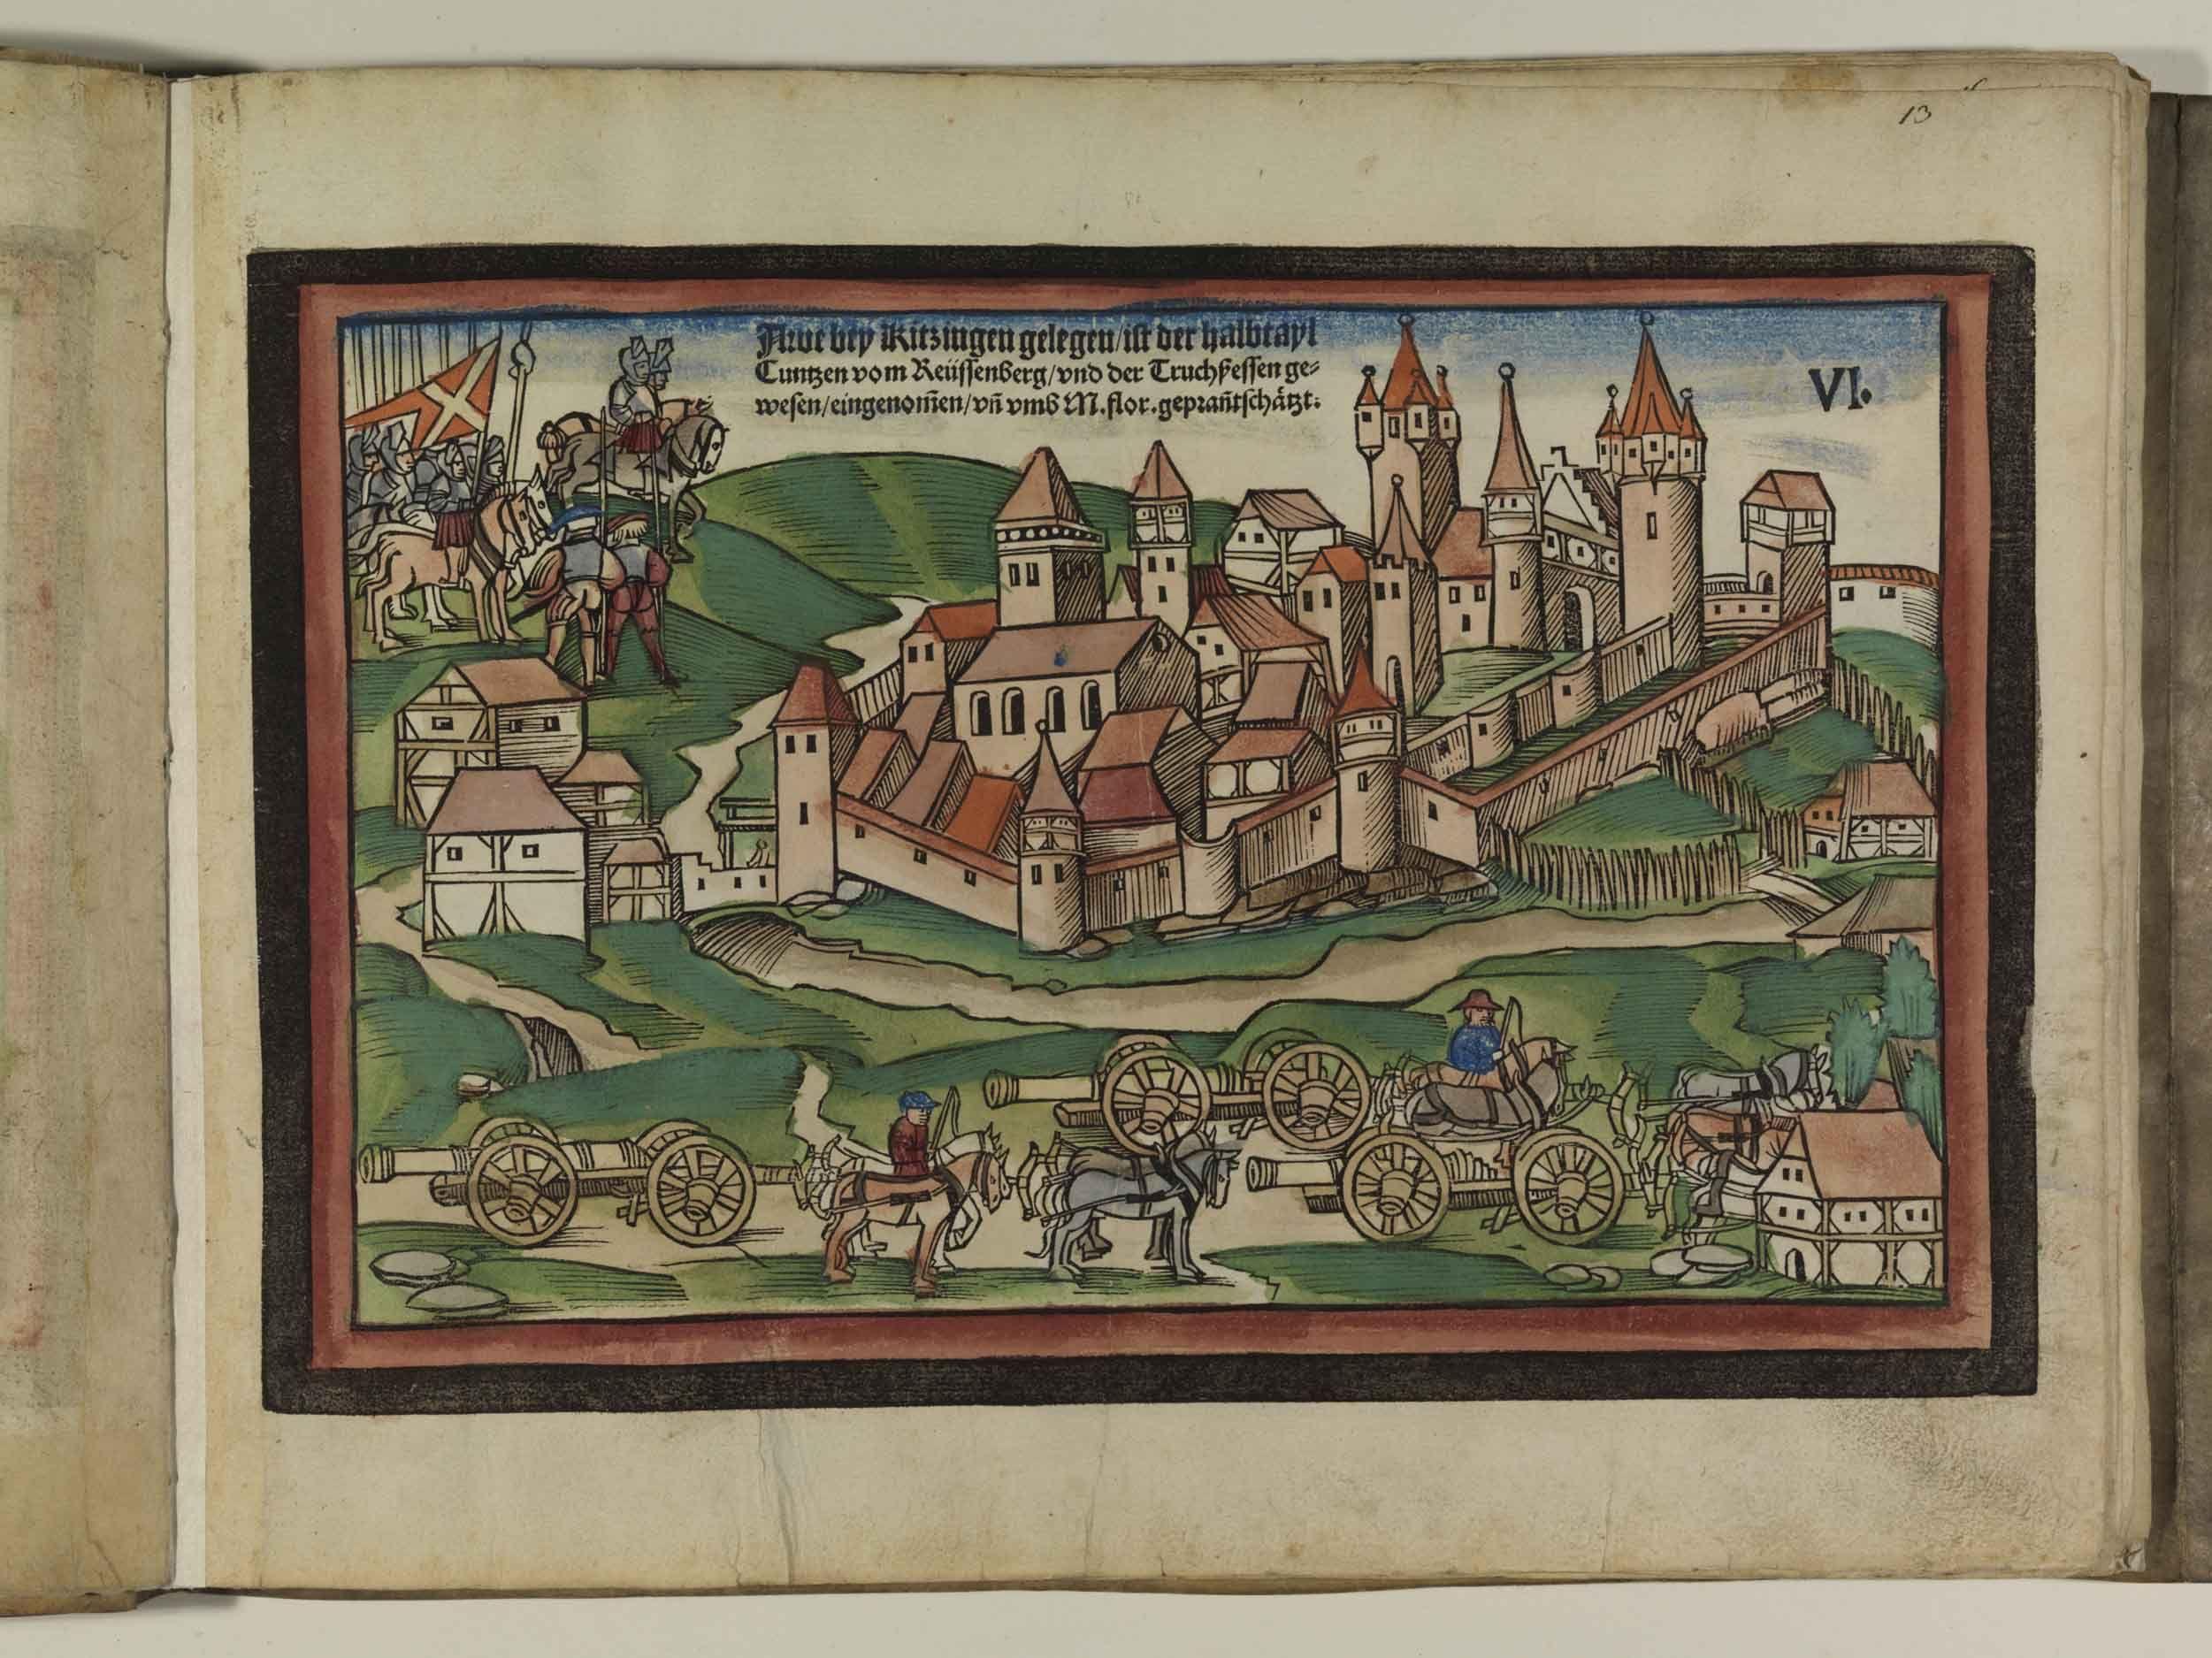 Artist: Unknown, Title: Bamberger Burgenbuch, Date: 1527, Page: 13